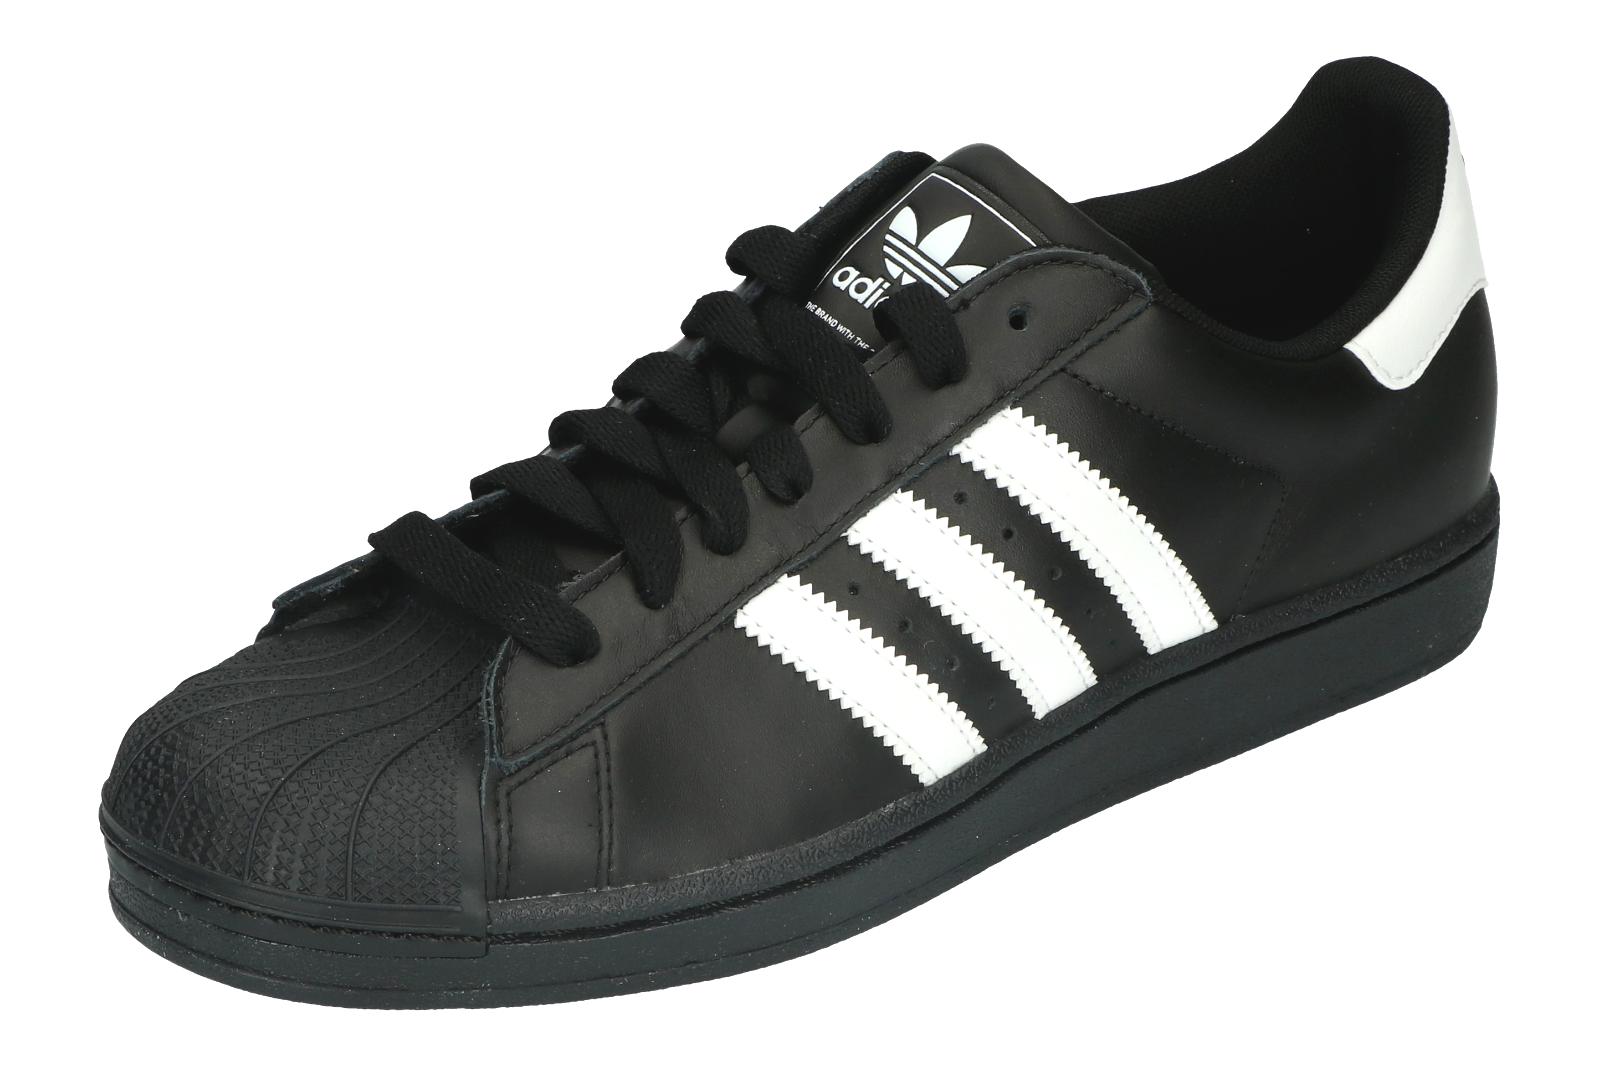 Adidas Originals Superstar Para Hombre 43 UE 43 Hombre 1/3 II Negro y Blanco Tenis G17067 a9bd2e